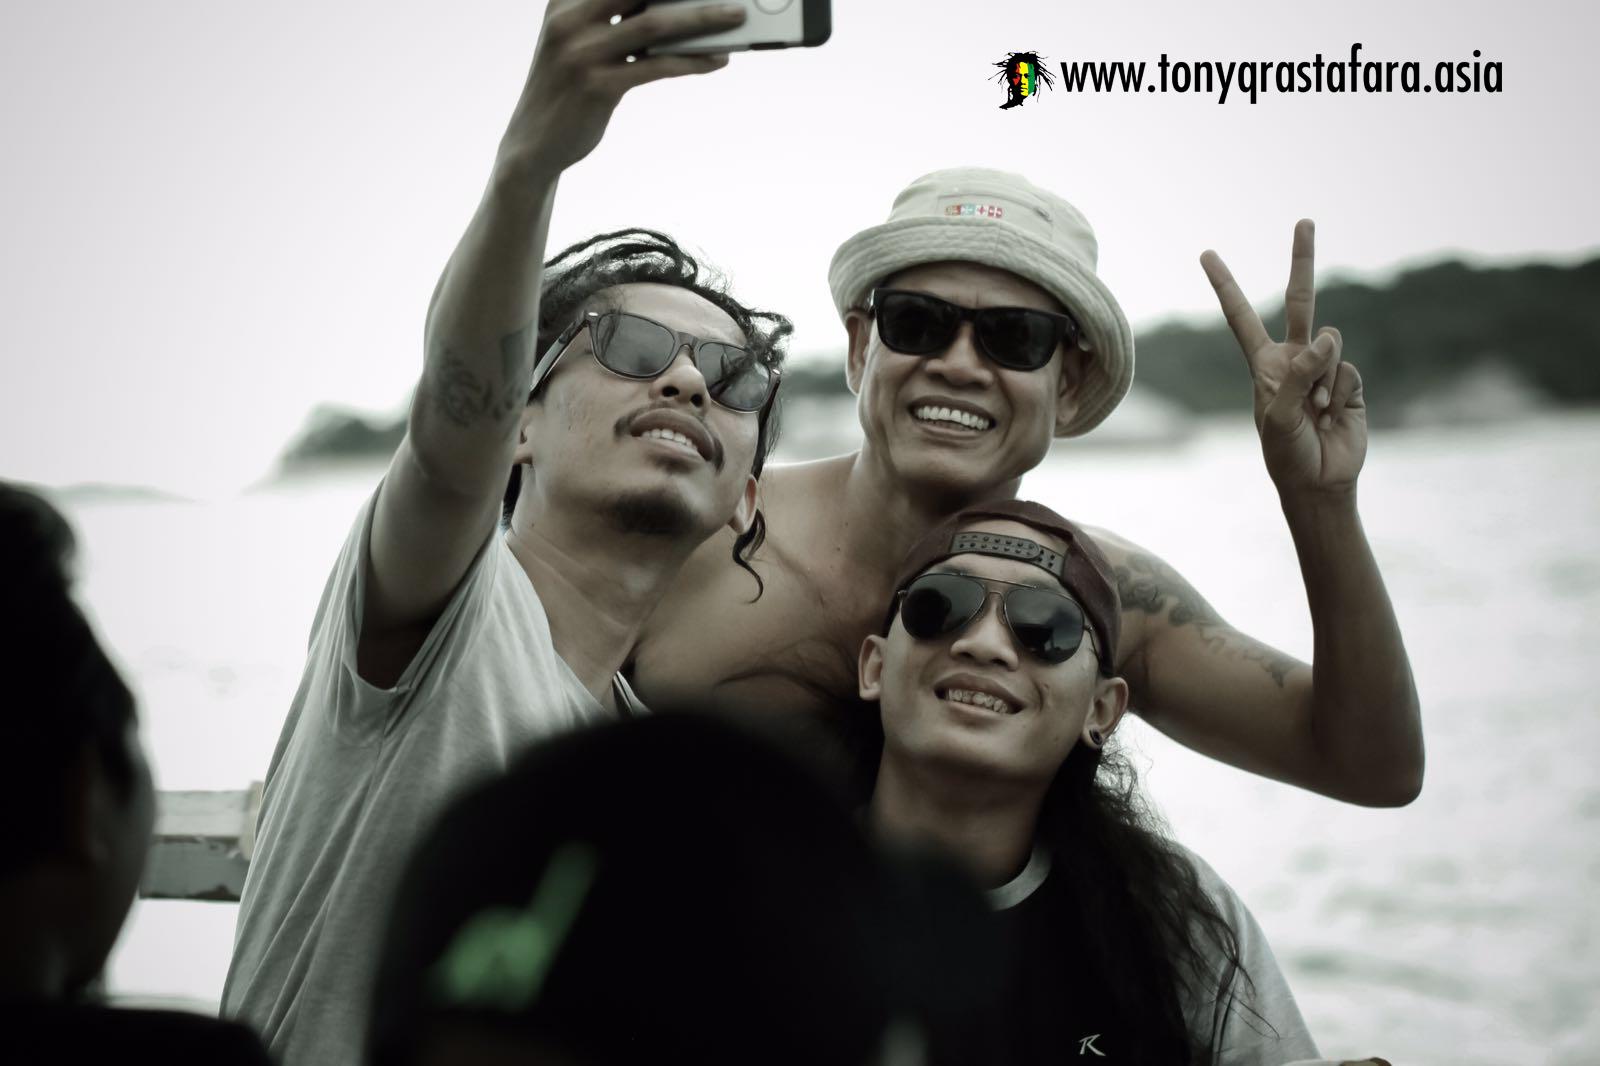 Tony Q Rastafara - Belitung